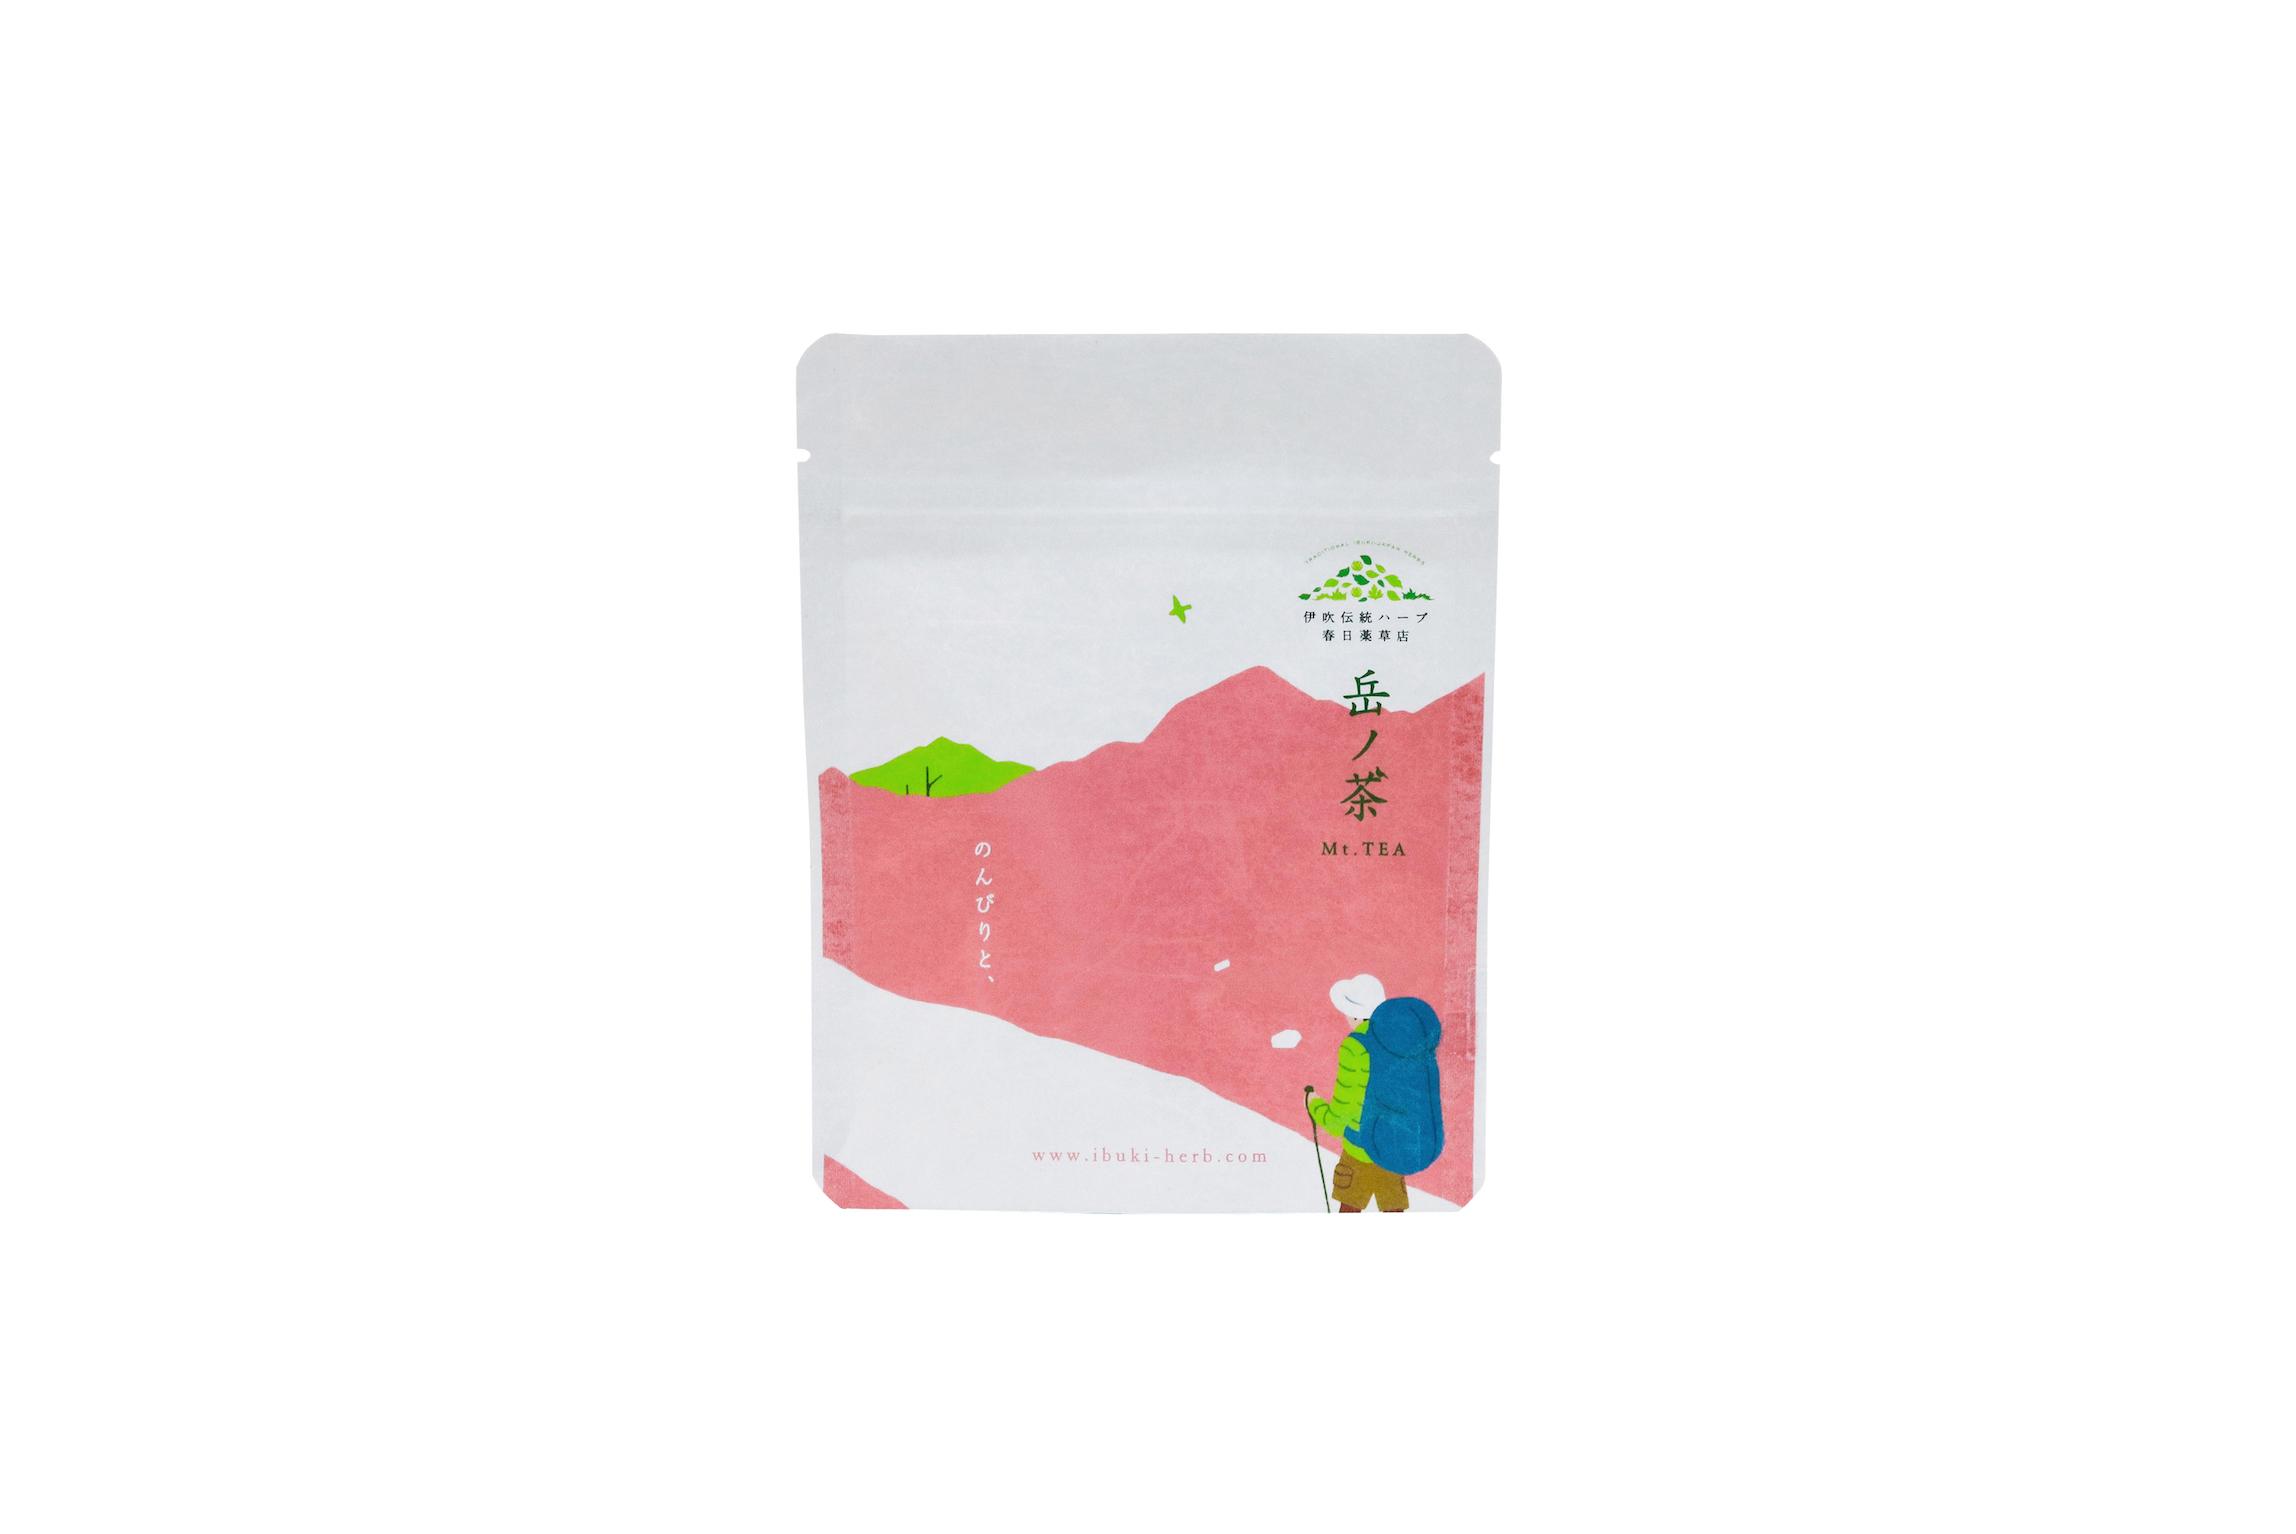 No,1 岳ノ茶-Mt TEA- (friend of mountain.label)